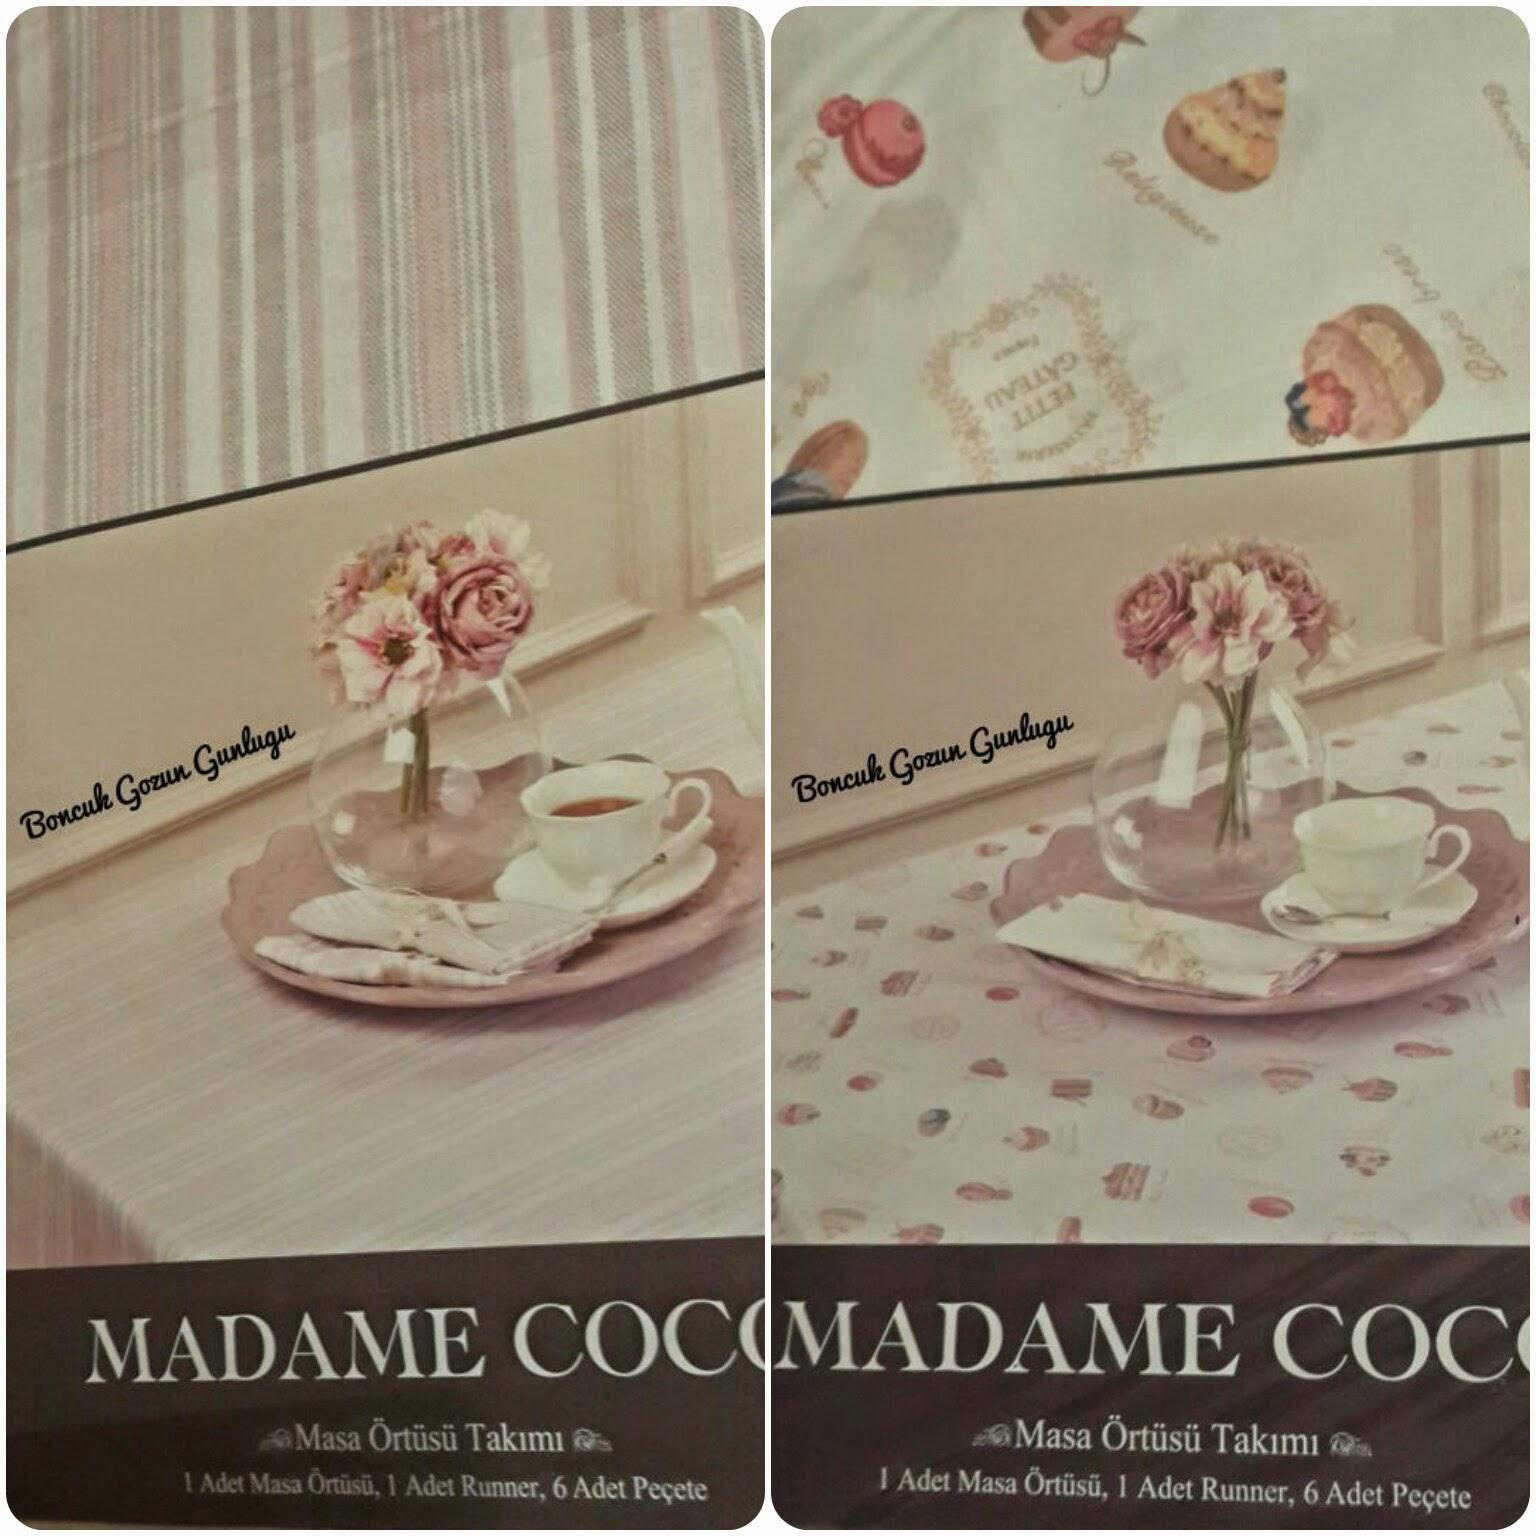 Madame Coco Masa Örtüsü runner